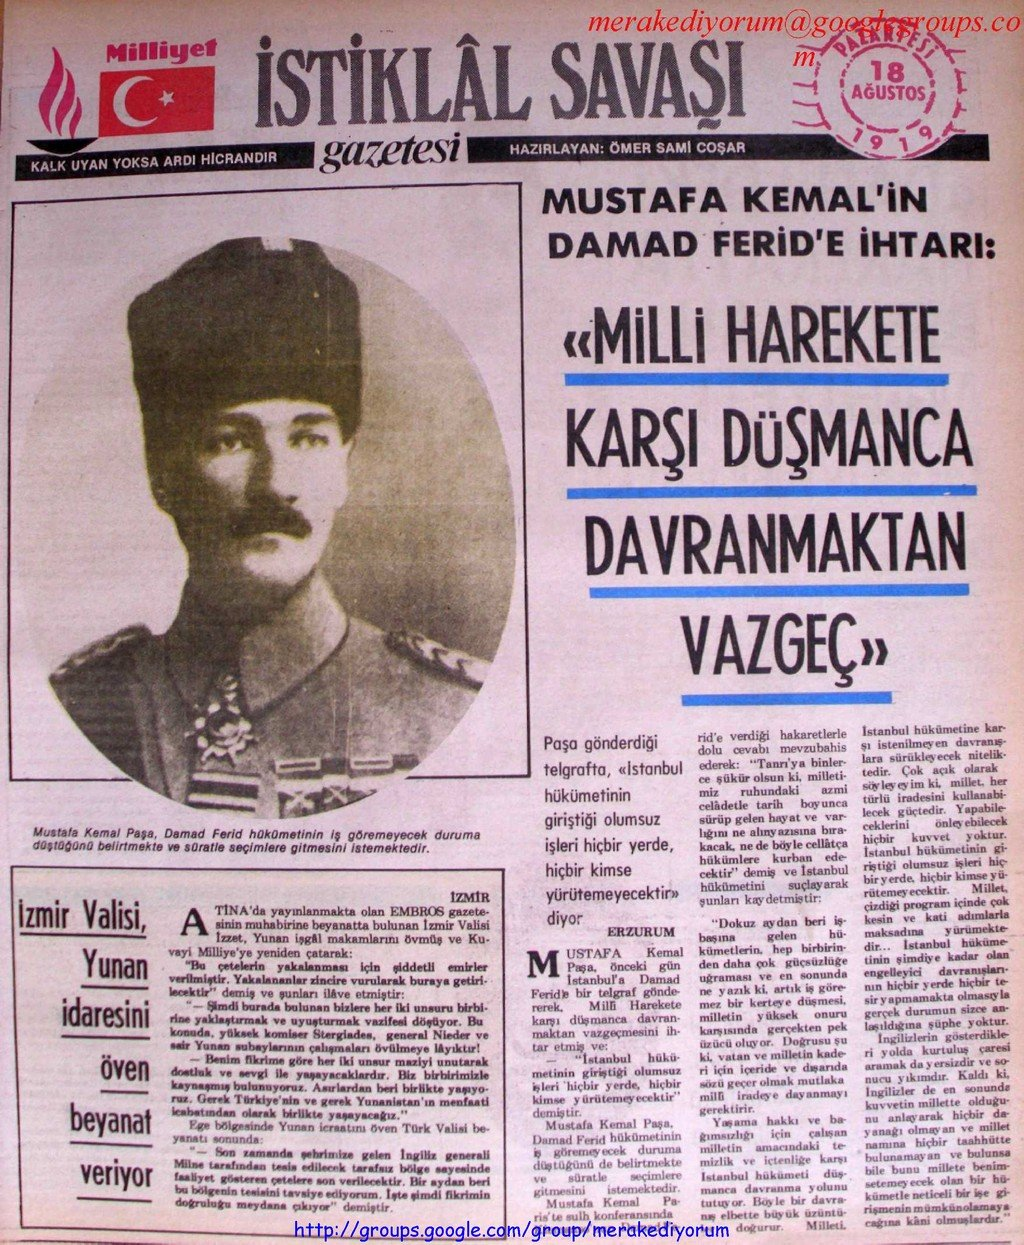 istiklal savaşı gazetesi - 18 ağustos 1919